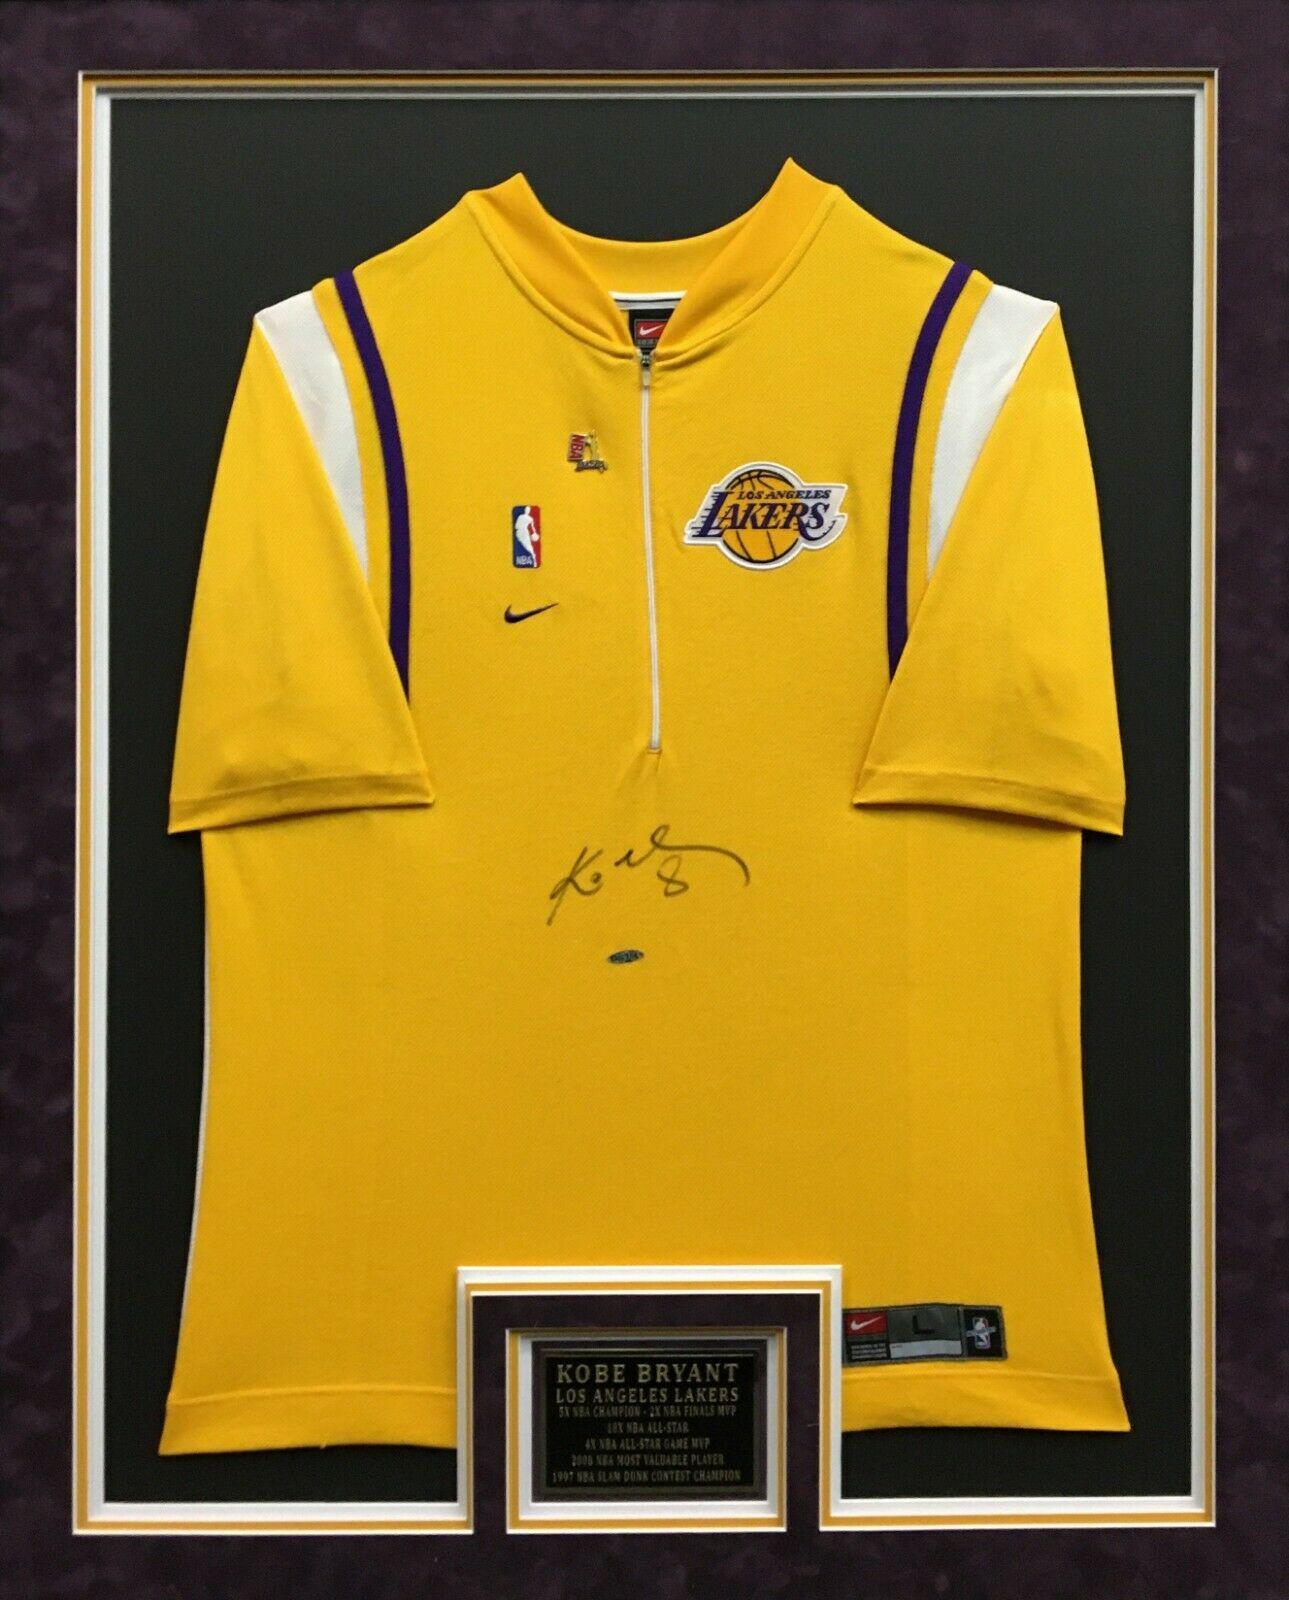 Kobe Bryant Signed & Framed Lakers Basketball Warm Up Jersey/Shirt Upper Deck